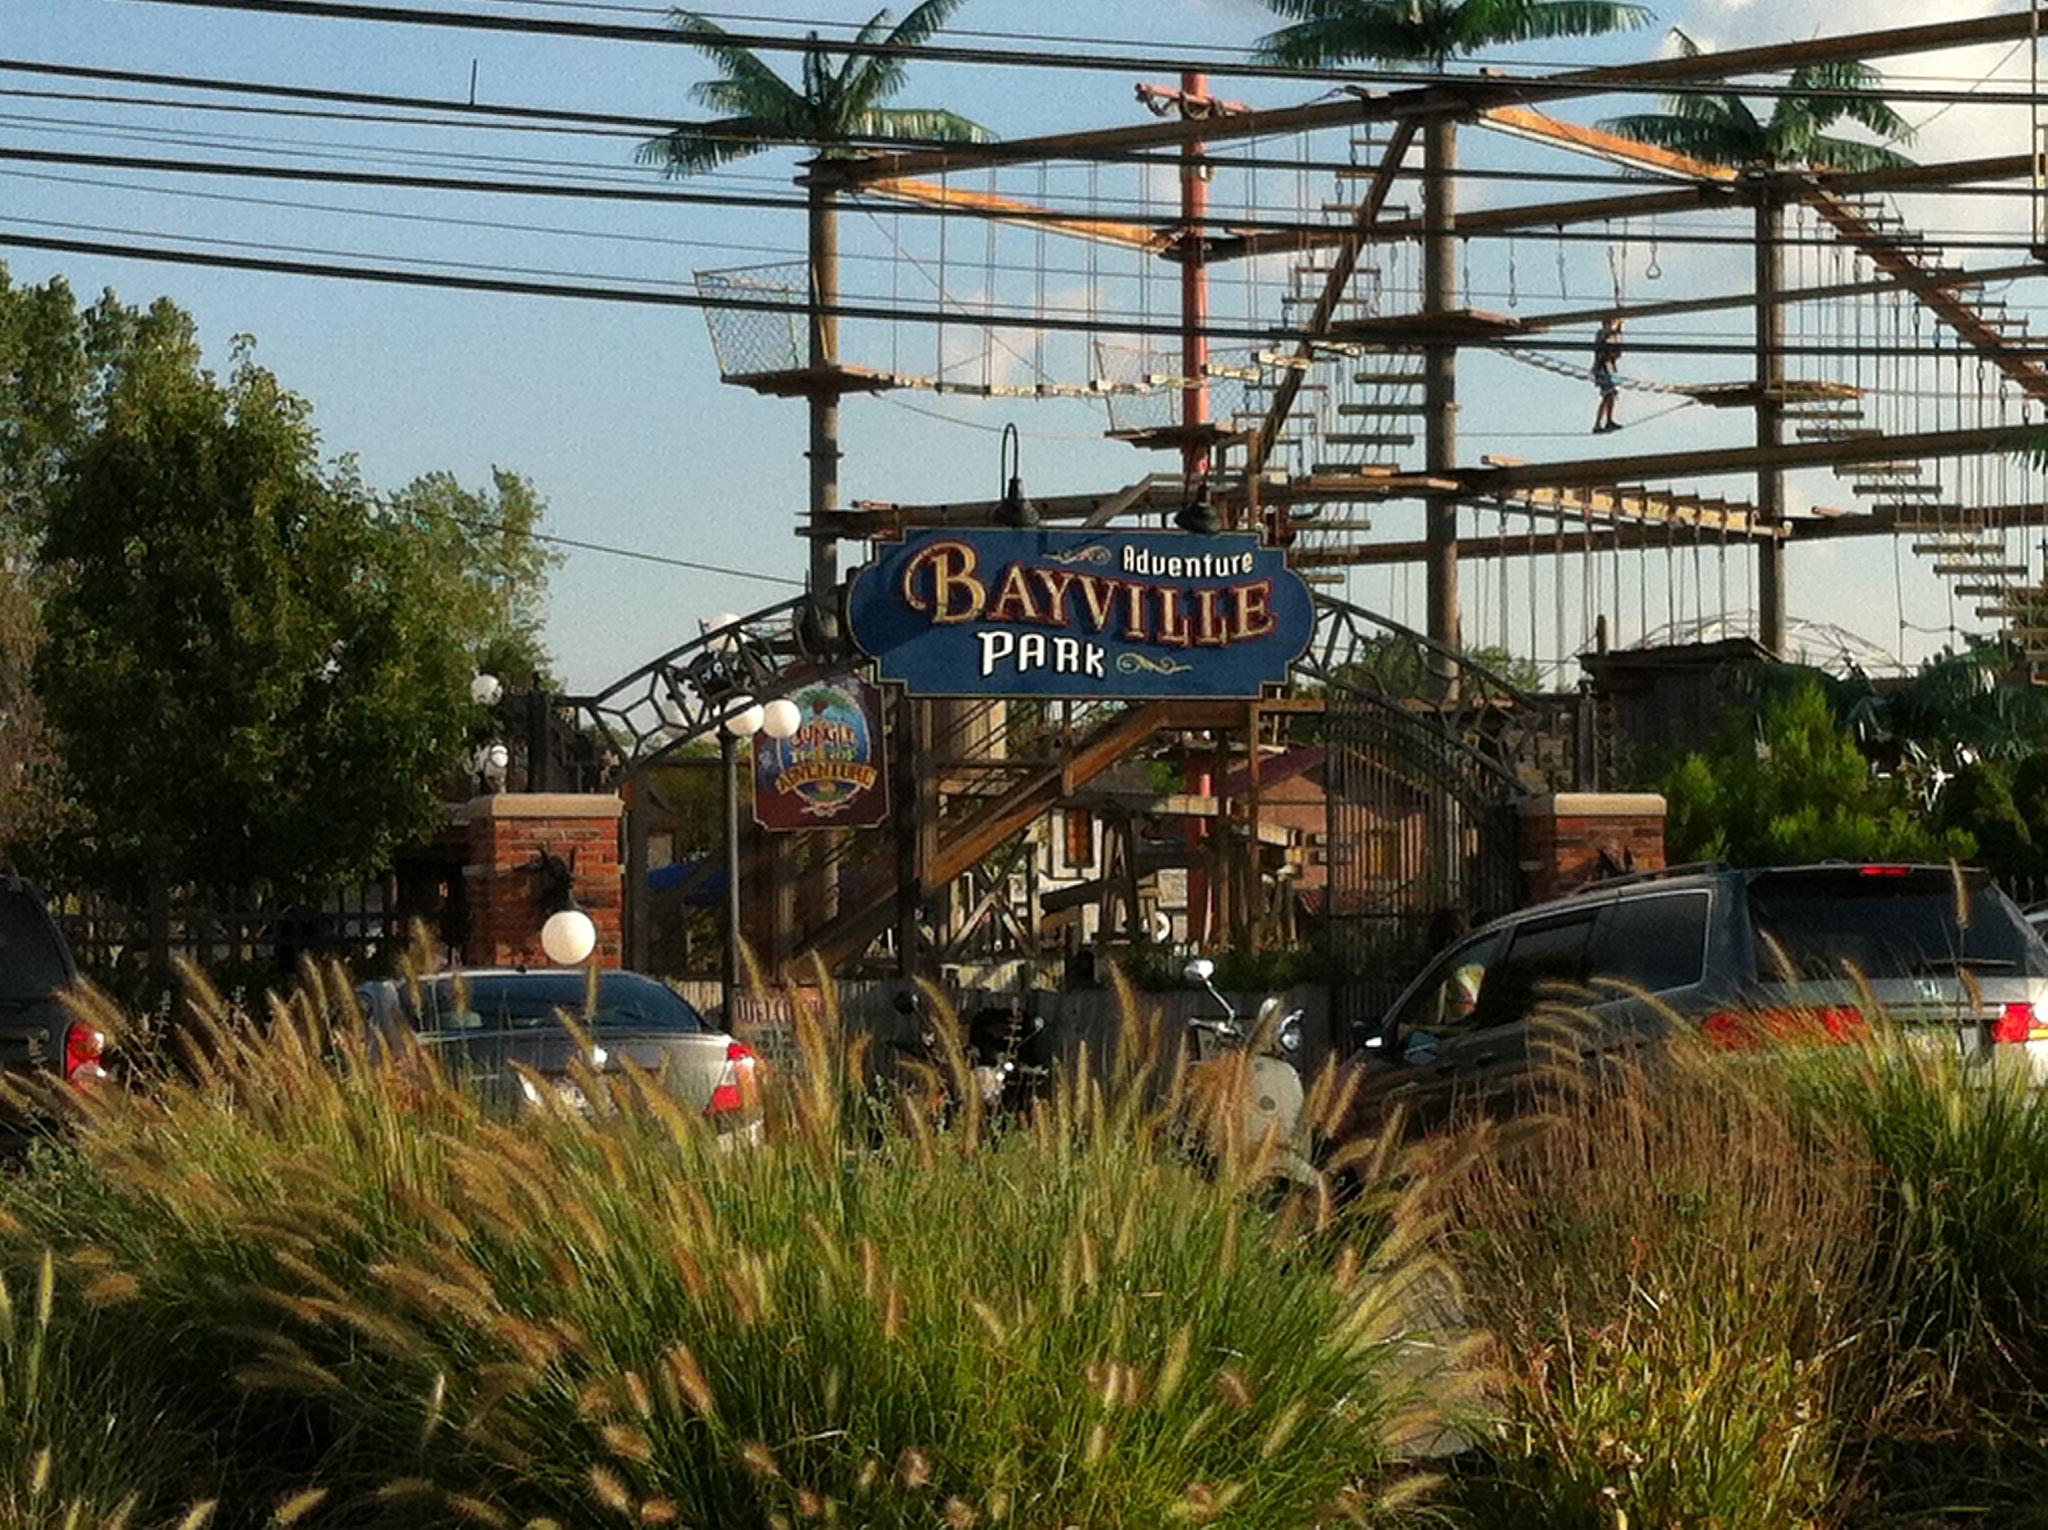 Bayville Adventure Park